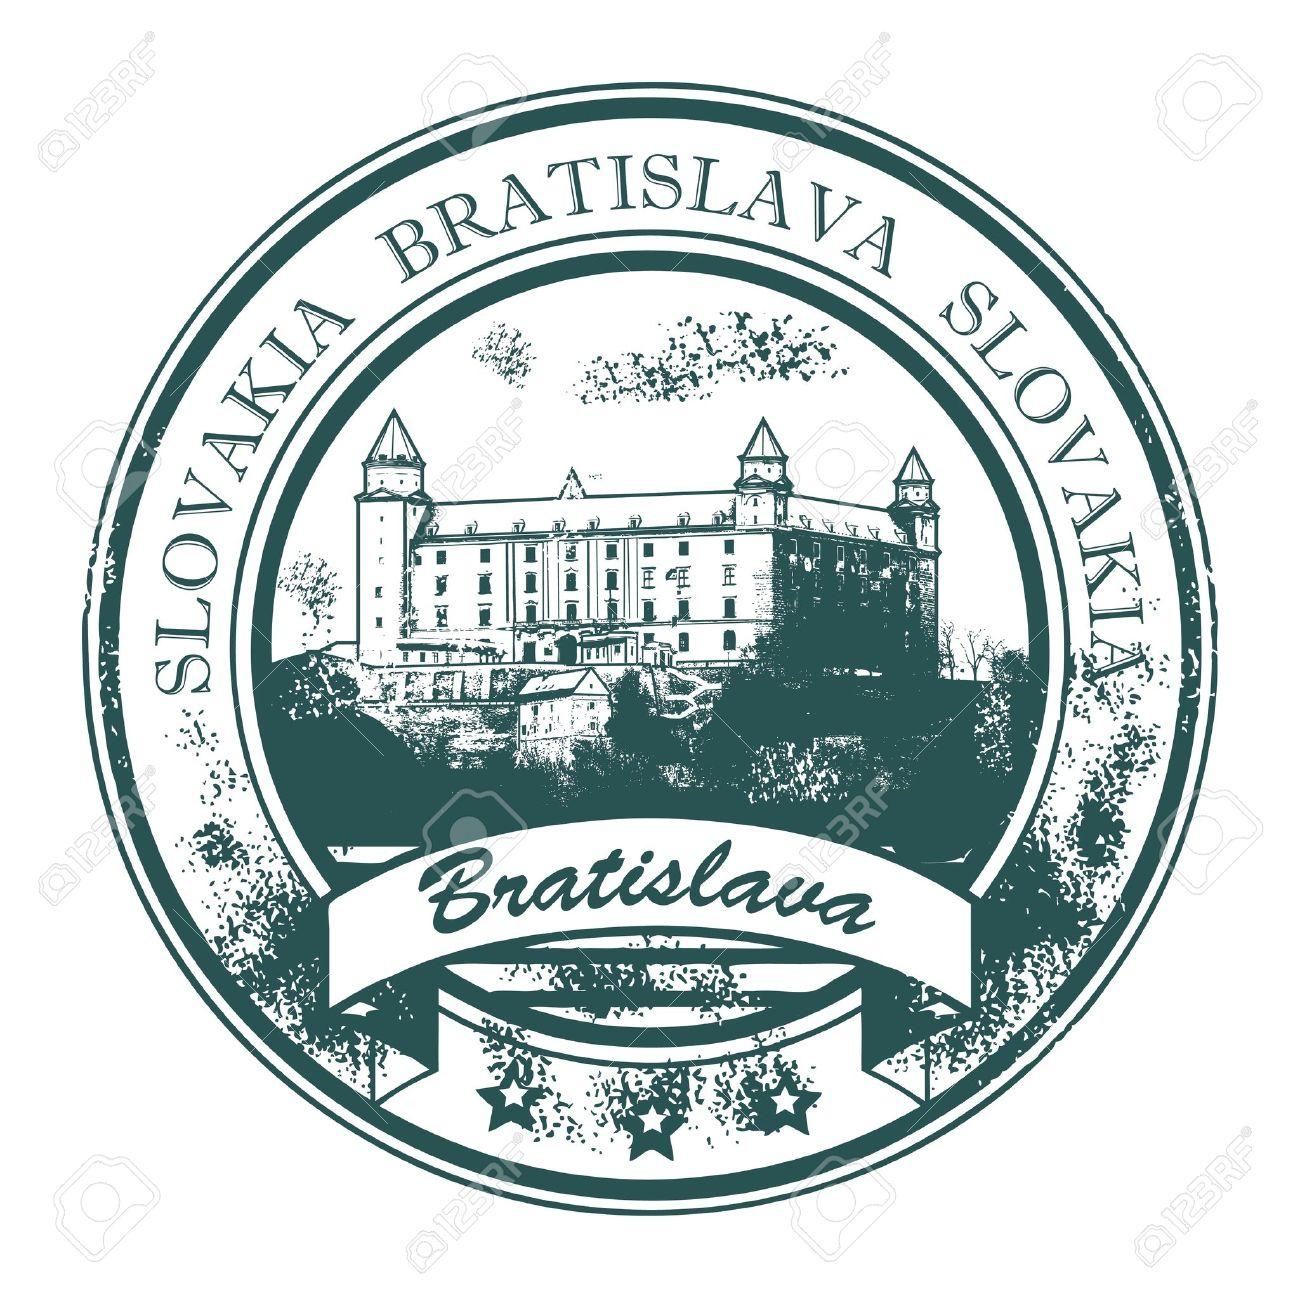 1,950 Bratislava Stock Vector Illustration And Royalty Free.